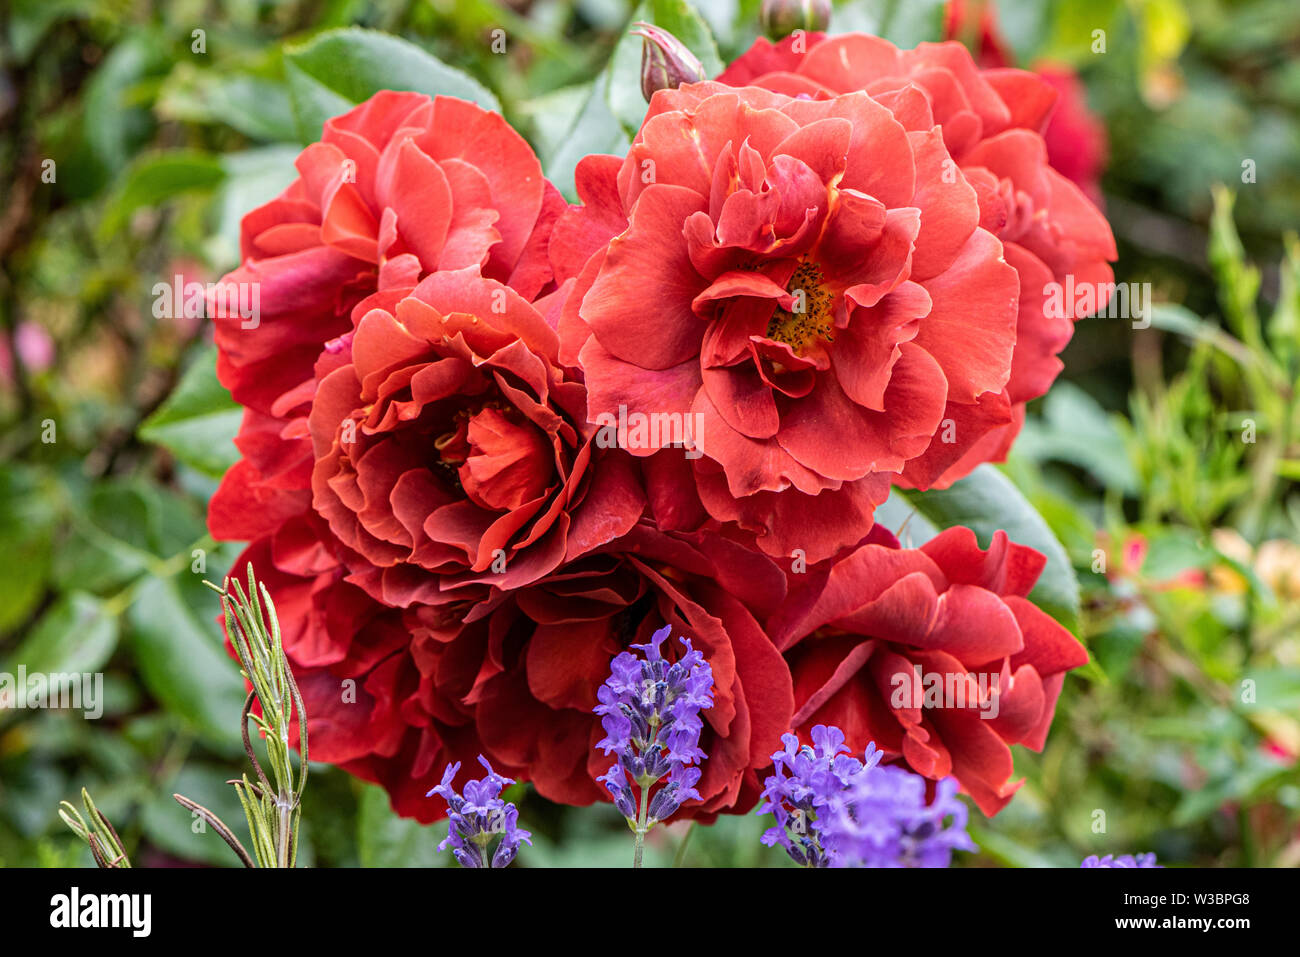 Red roses in garden in Burbage, Wiltshire, UK - Stock Image